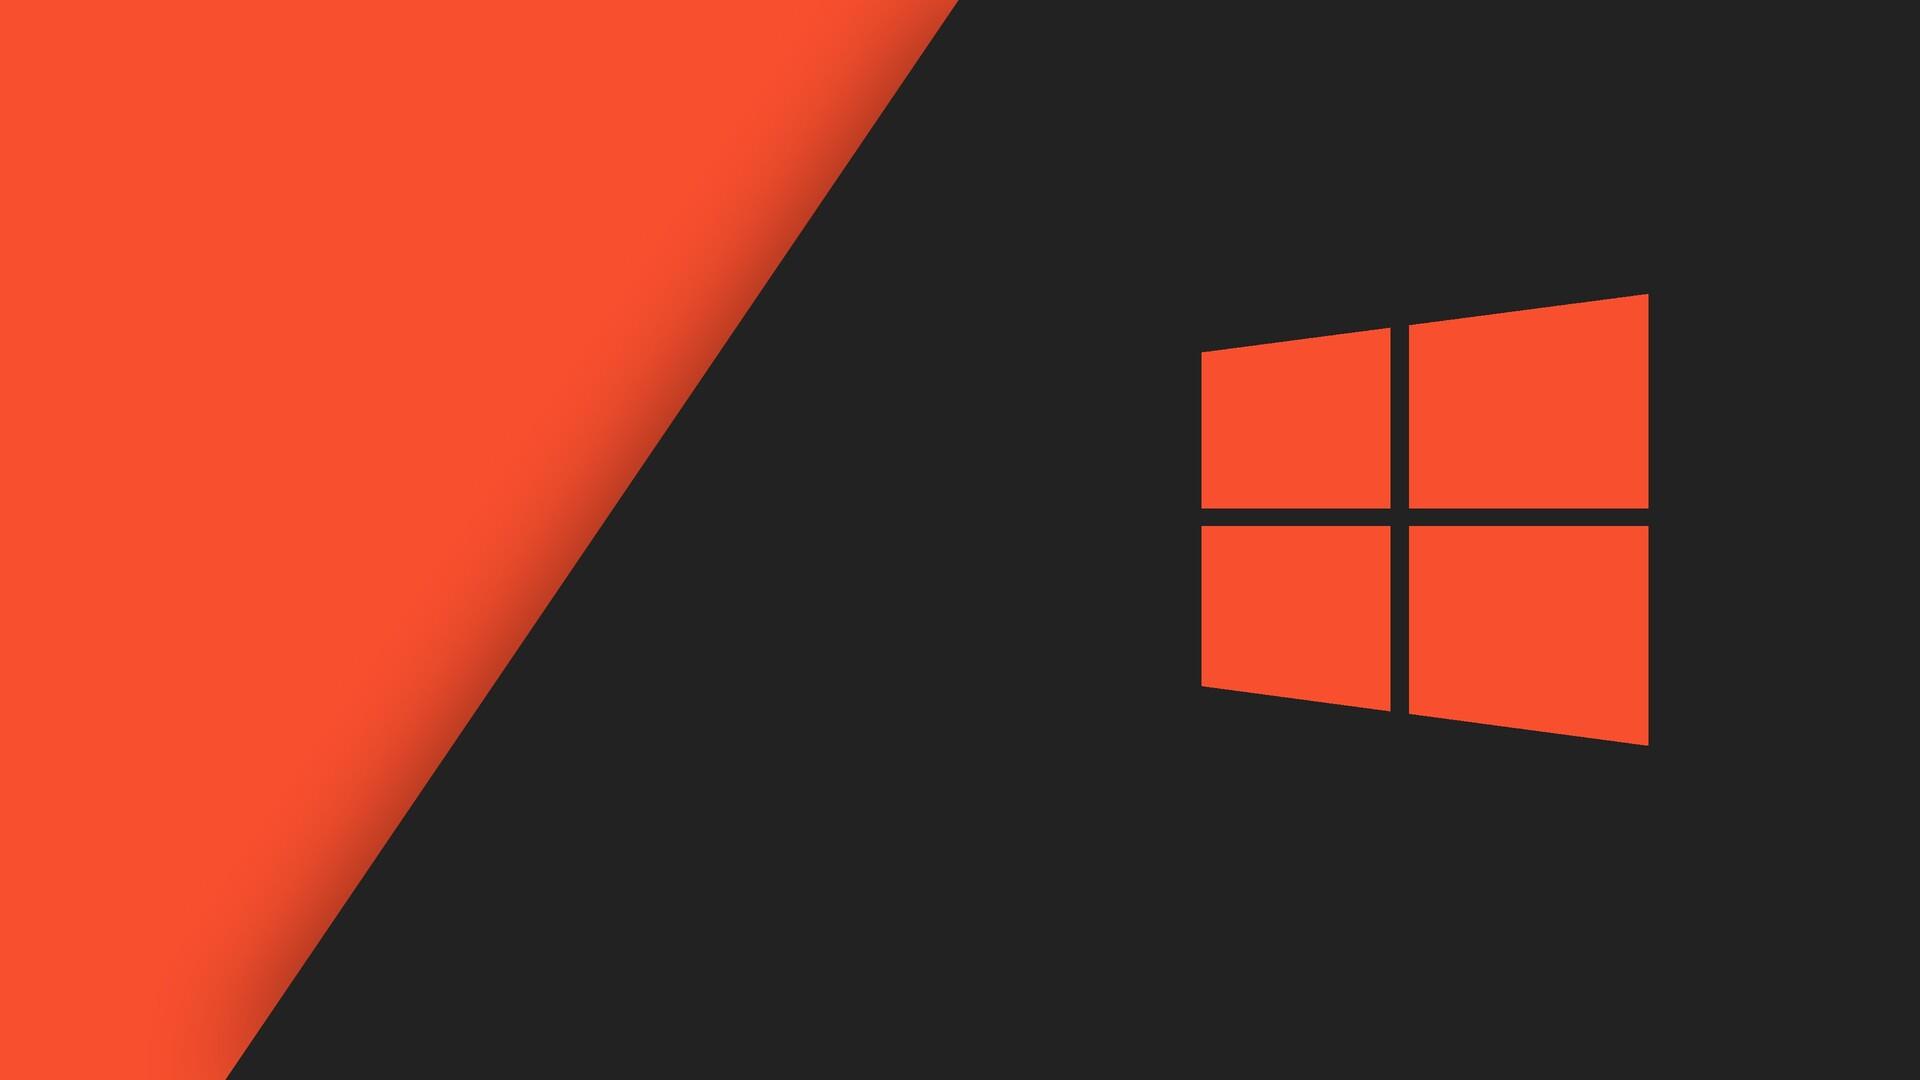 1920x1080 Windows 10 Orange Stock Laptop Full Hd 1080p Hd 4k